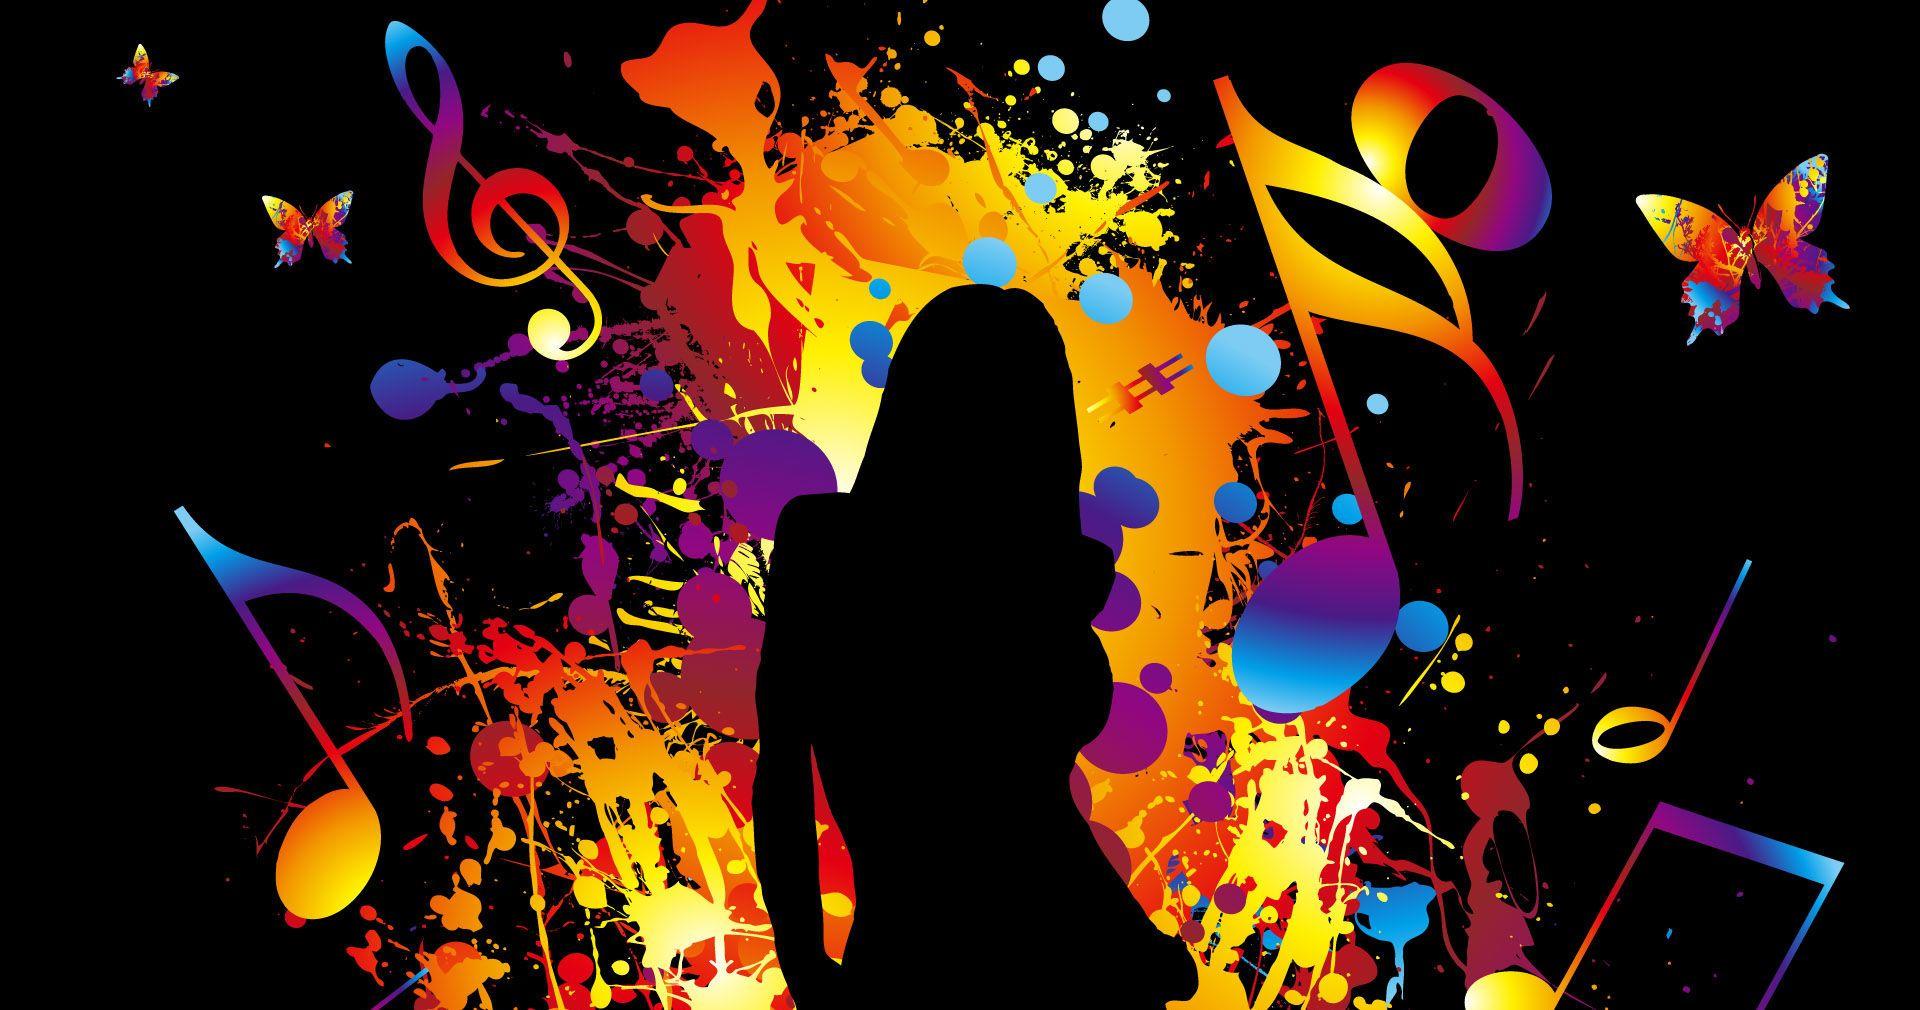 Music Quiz Music Wallpaper Cool Wallpapers Music Background Hd Wallpaper